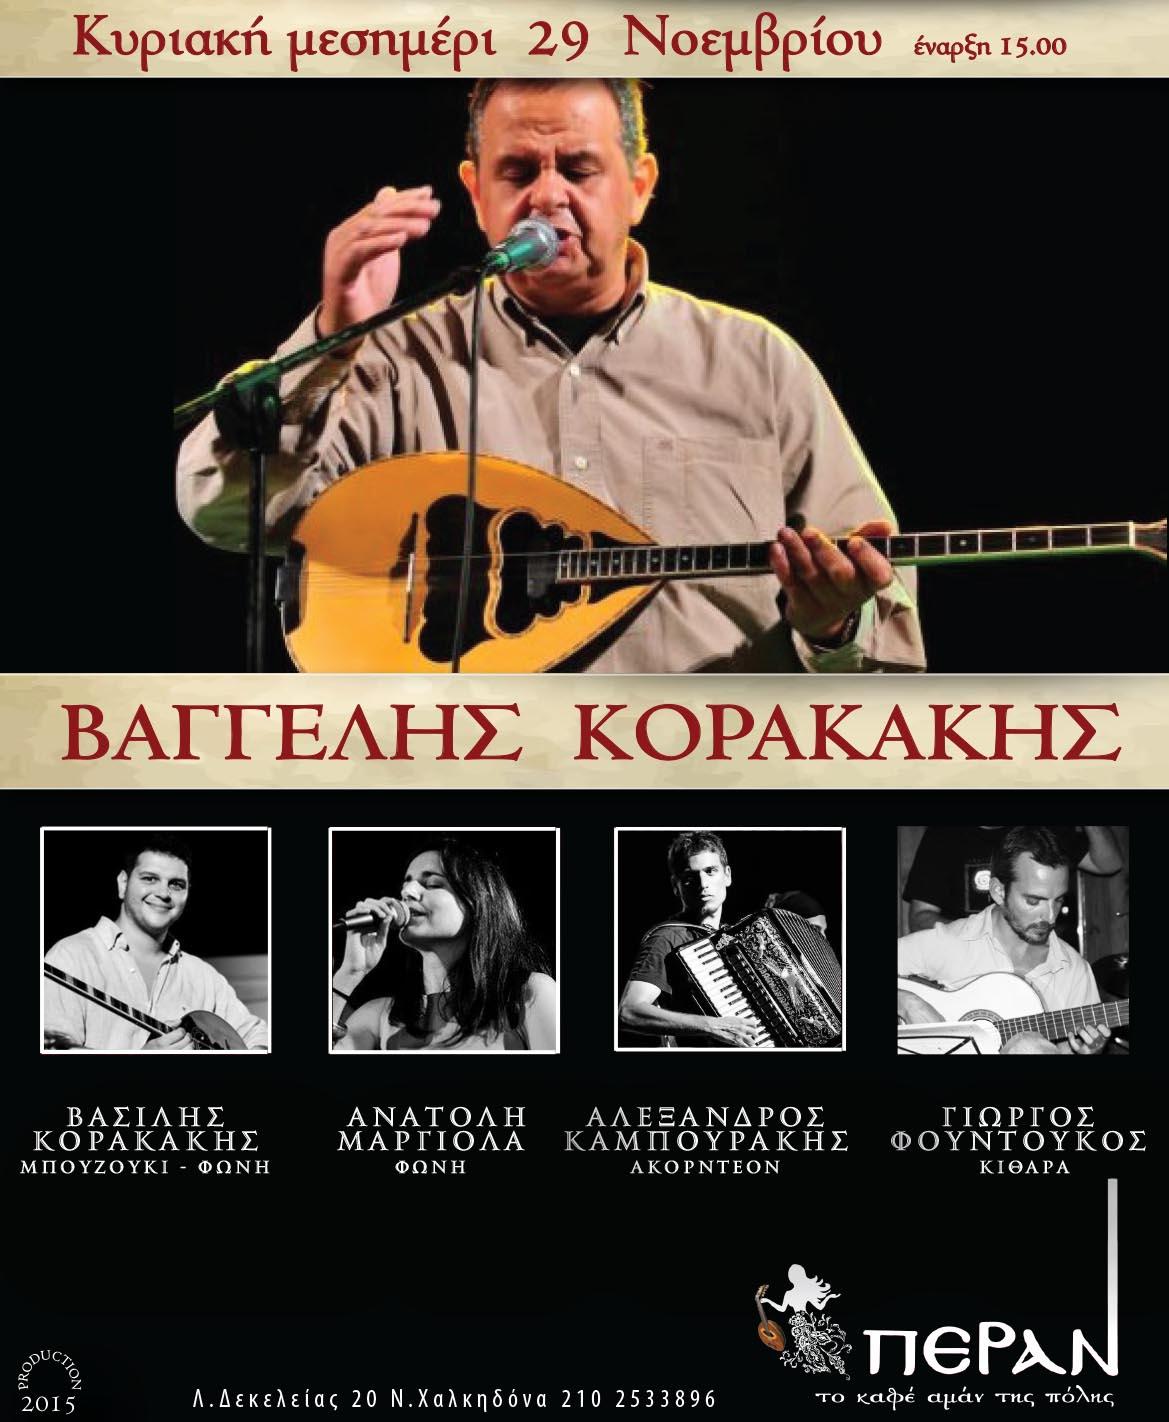 Korakakis2911